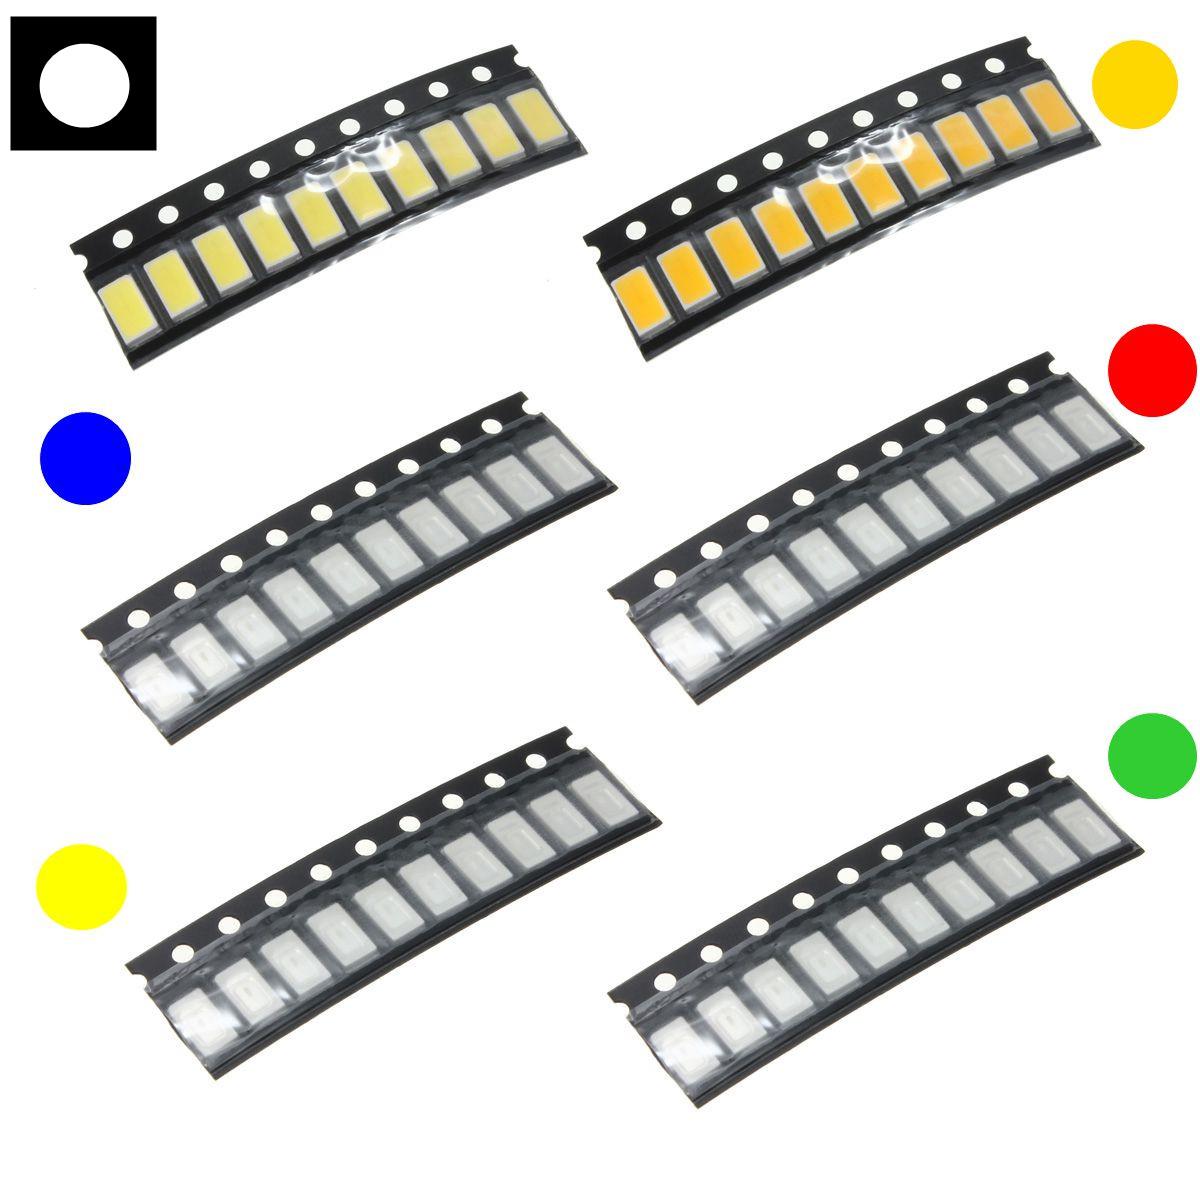 smt led strip jpg 422x640